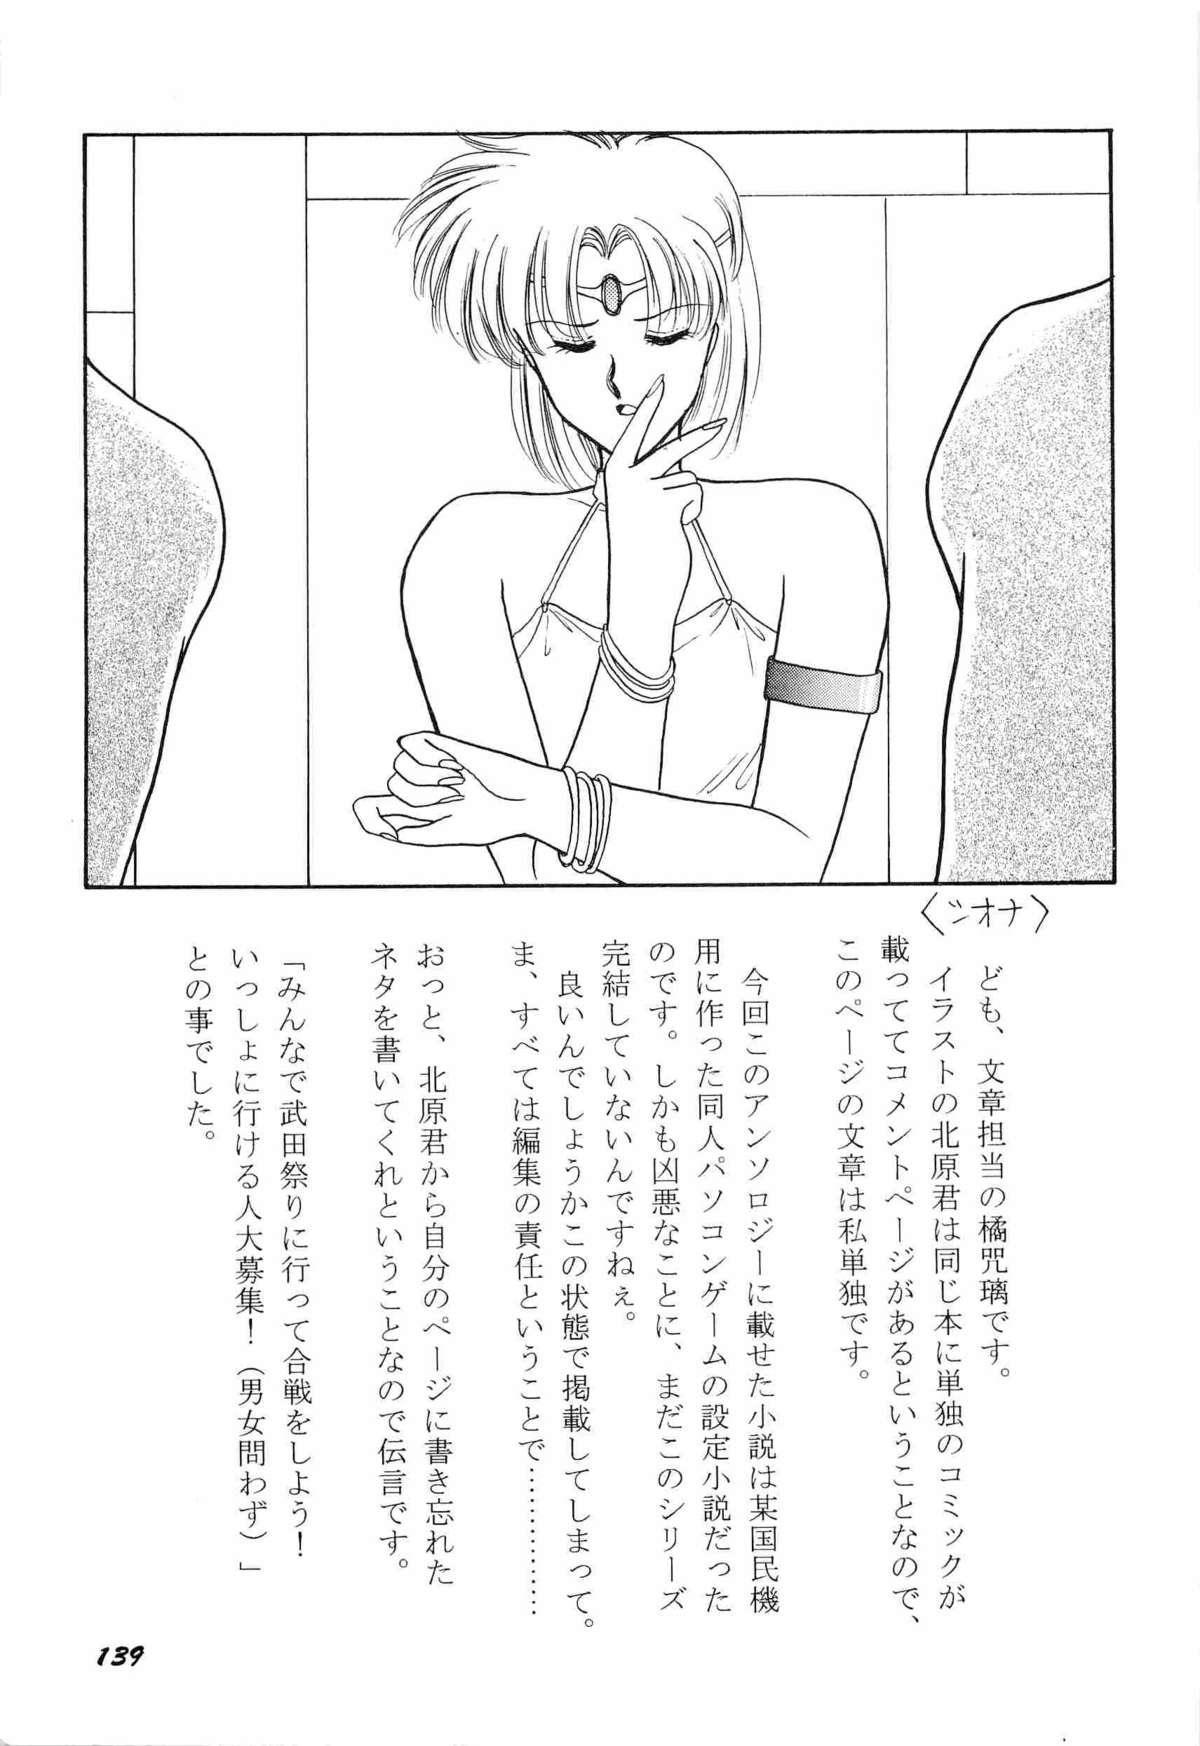 Bisyoujo Anthology '93 jyoukan 141